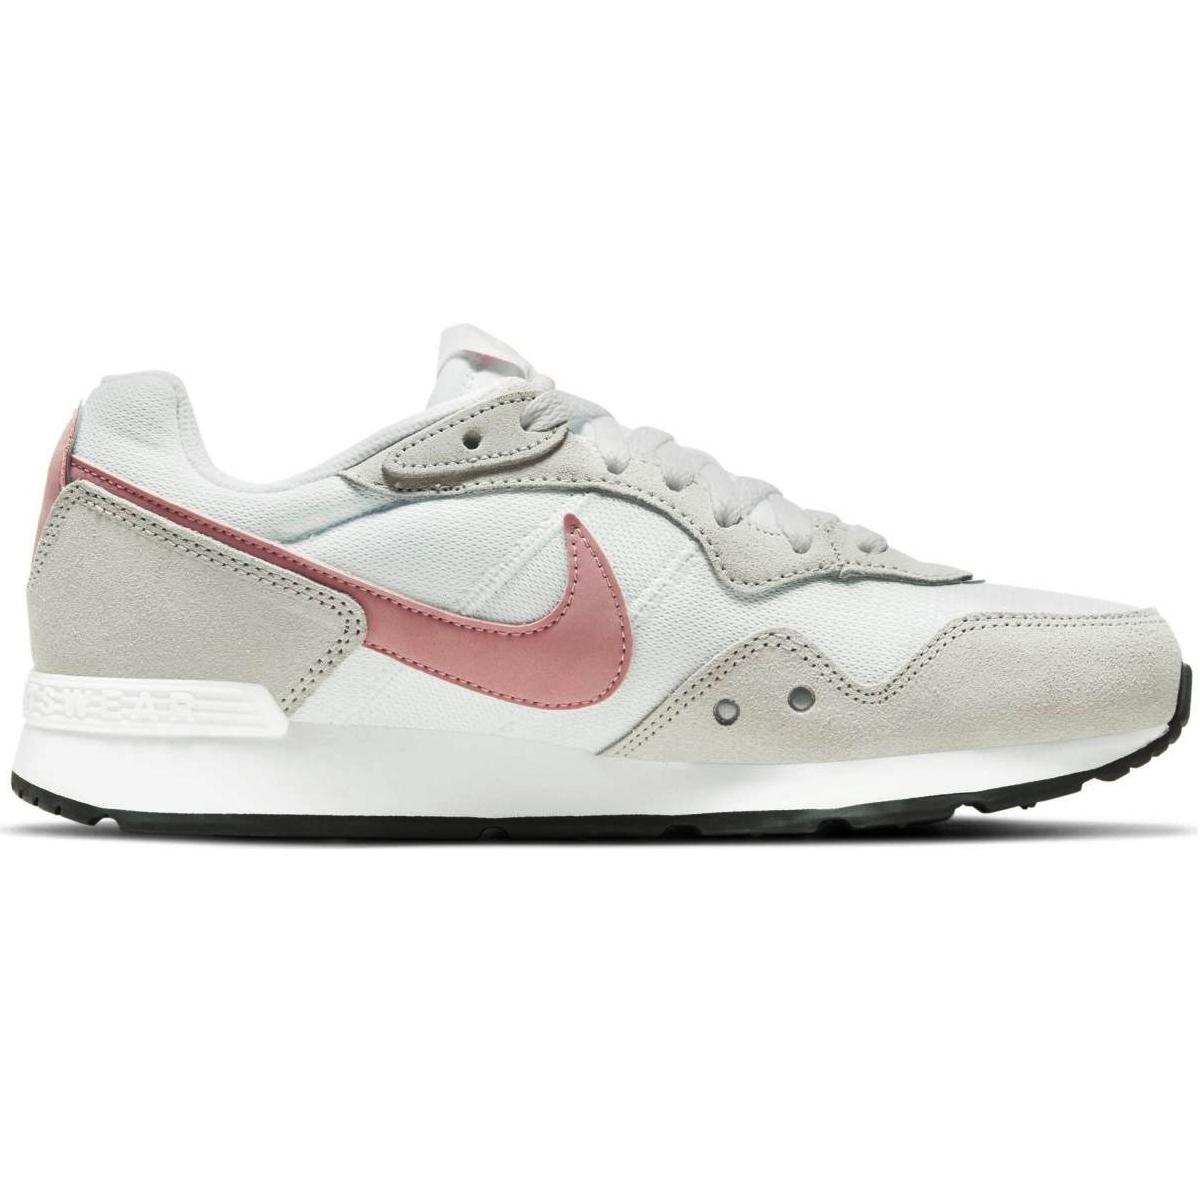 Nike WMNS Venture Runner Retro Sneaker weiß rosa